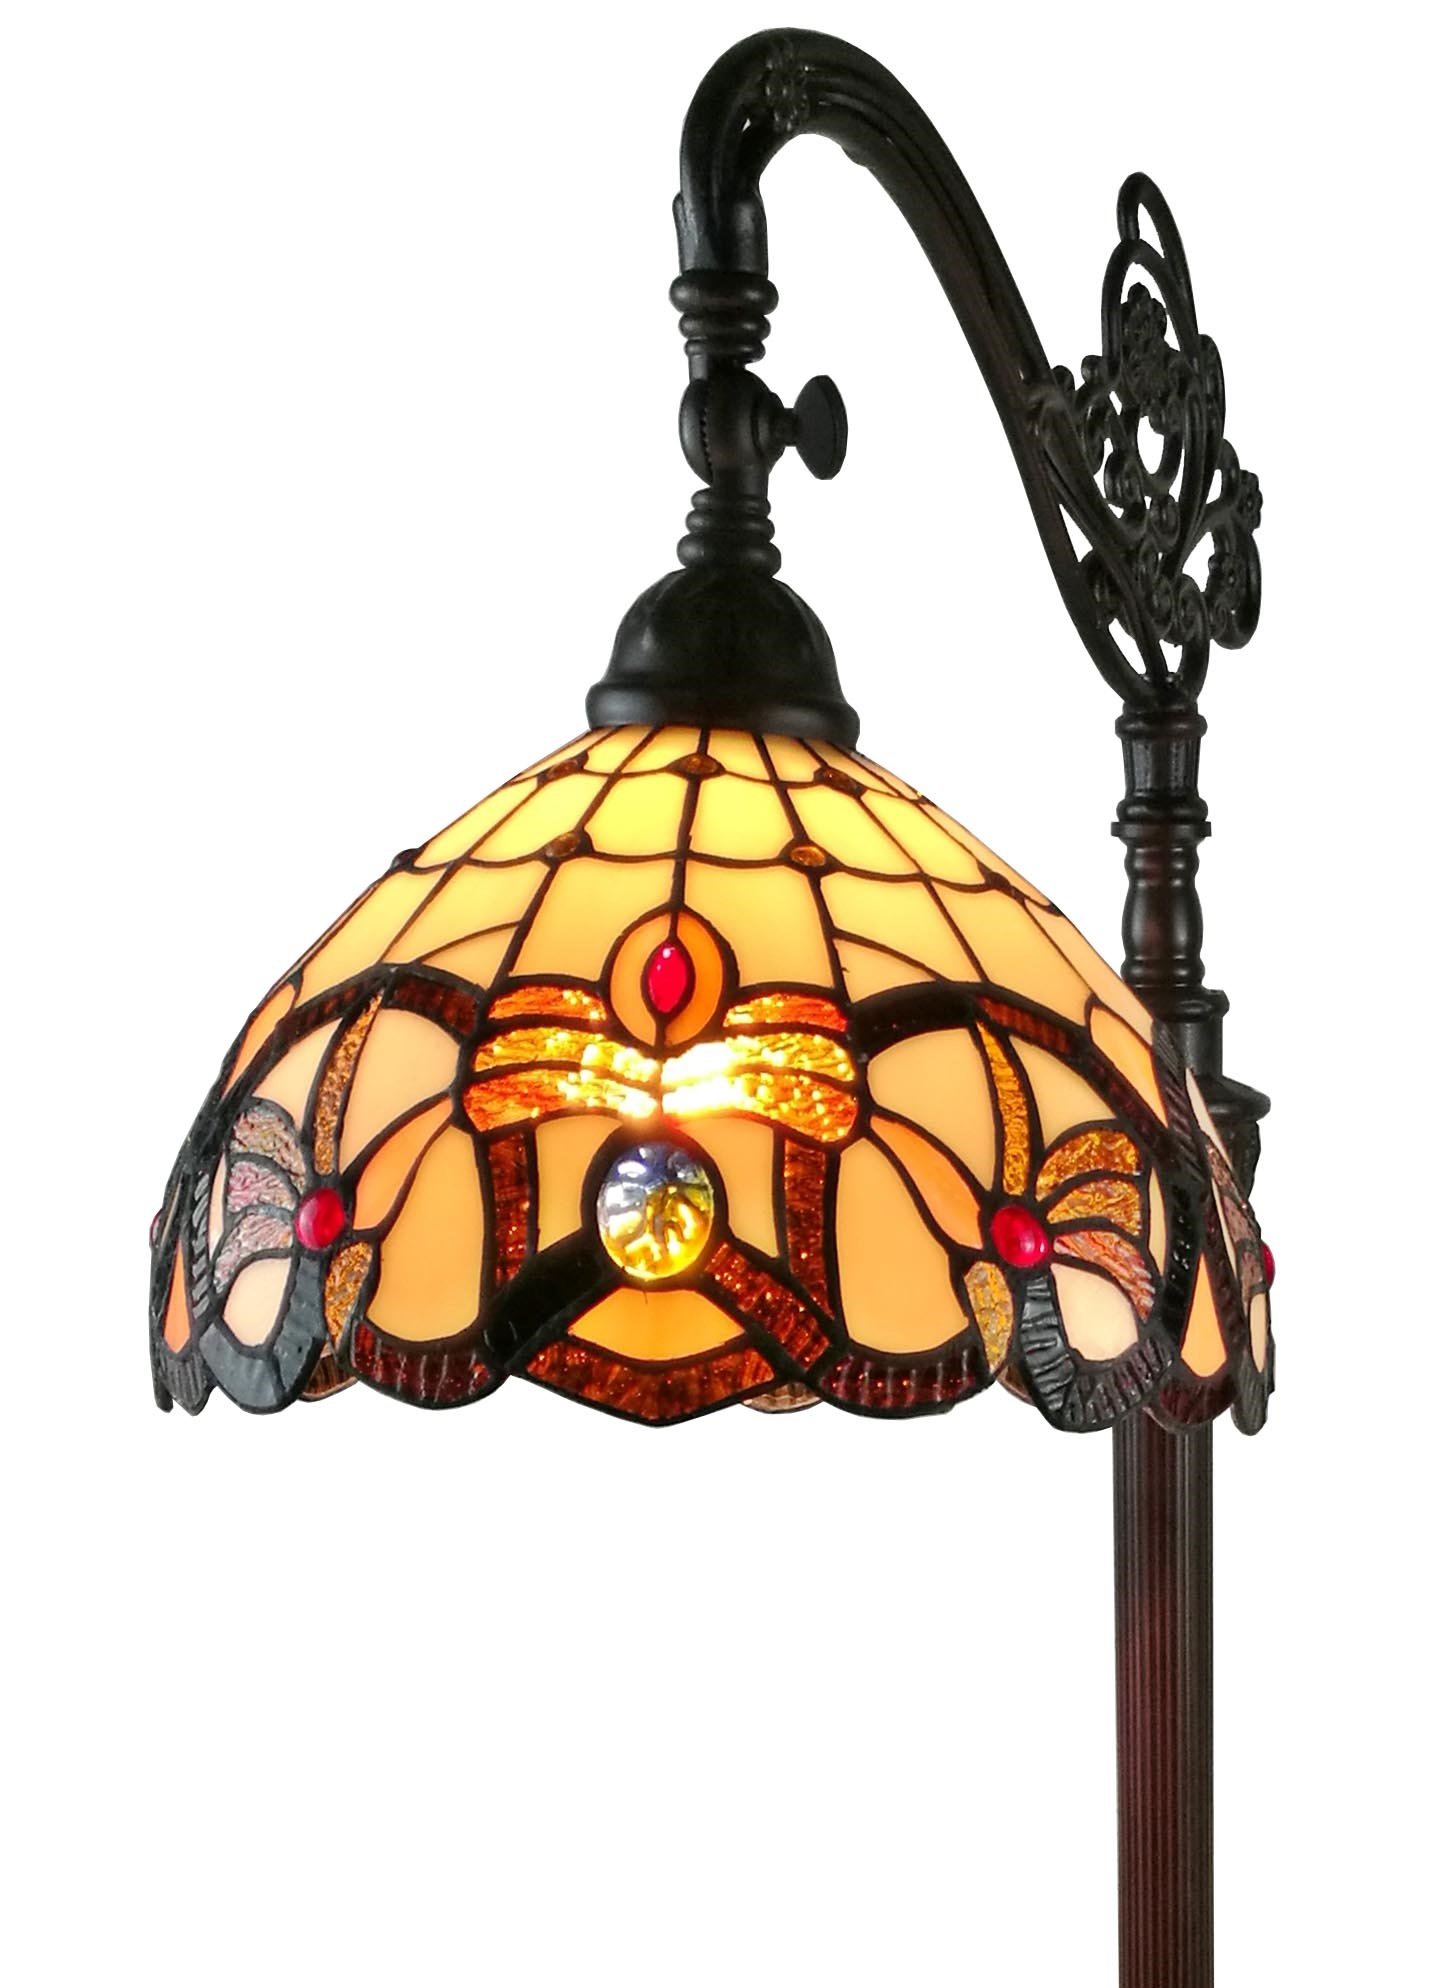 62 Inch Tiffany Style Victorian Reading Floor Lamp